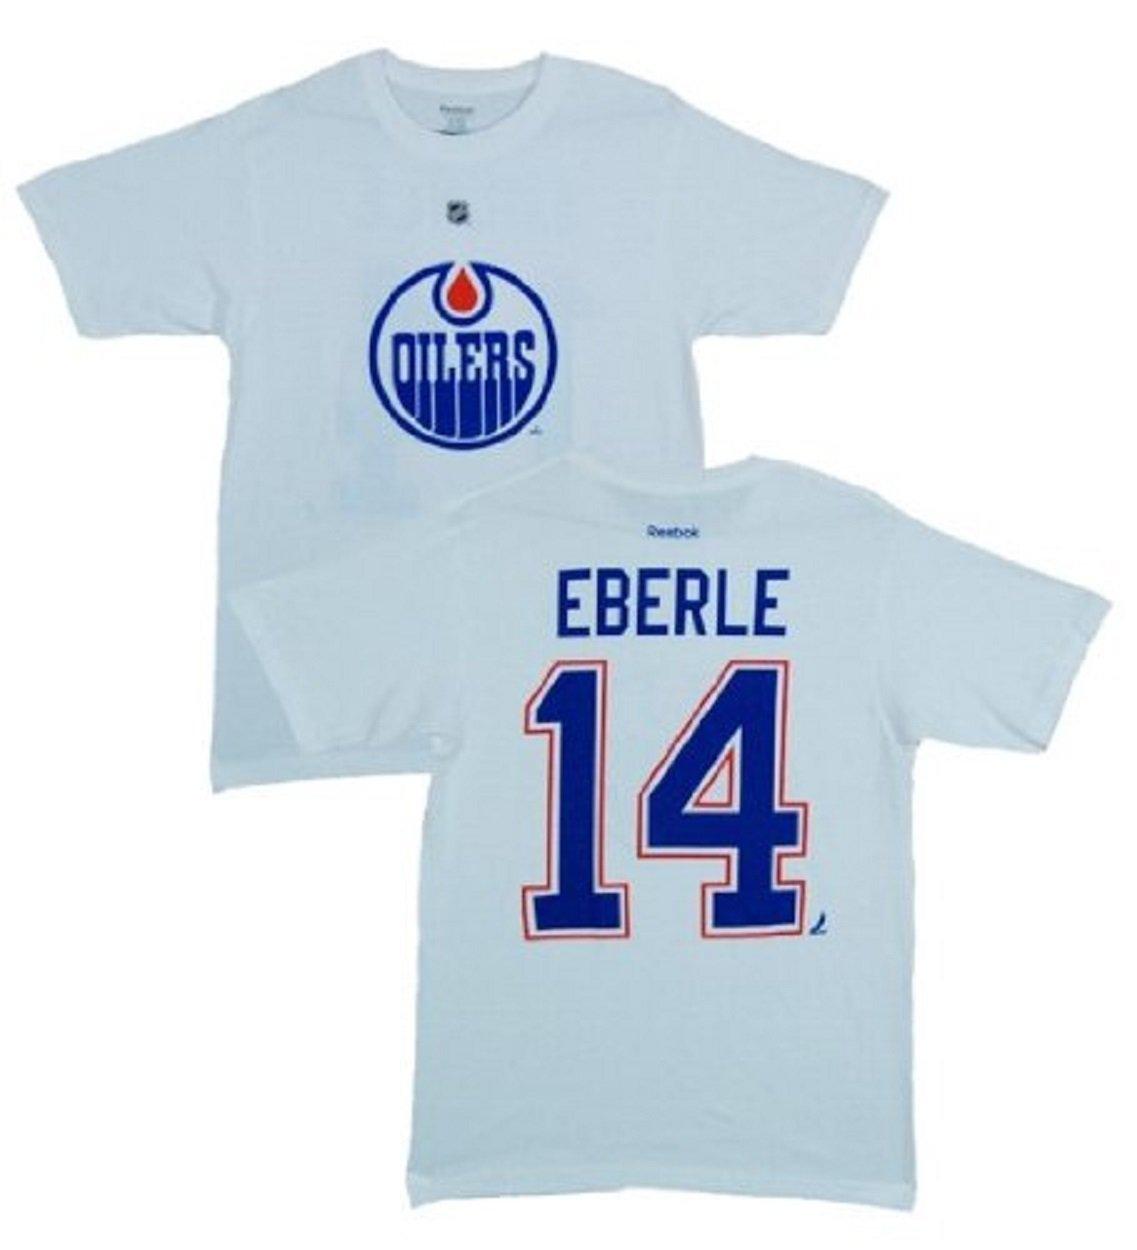 huge discount e6b4a 74ec9 Amazon.com : Reebok Edmonton Oilers Jordan Eberle White Name ...